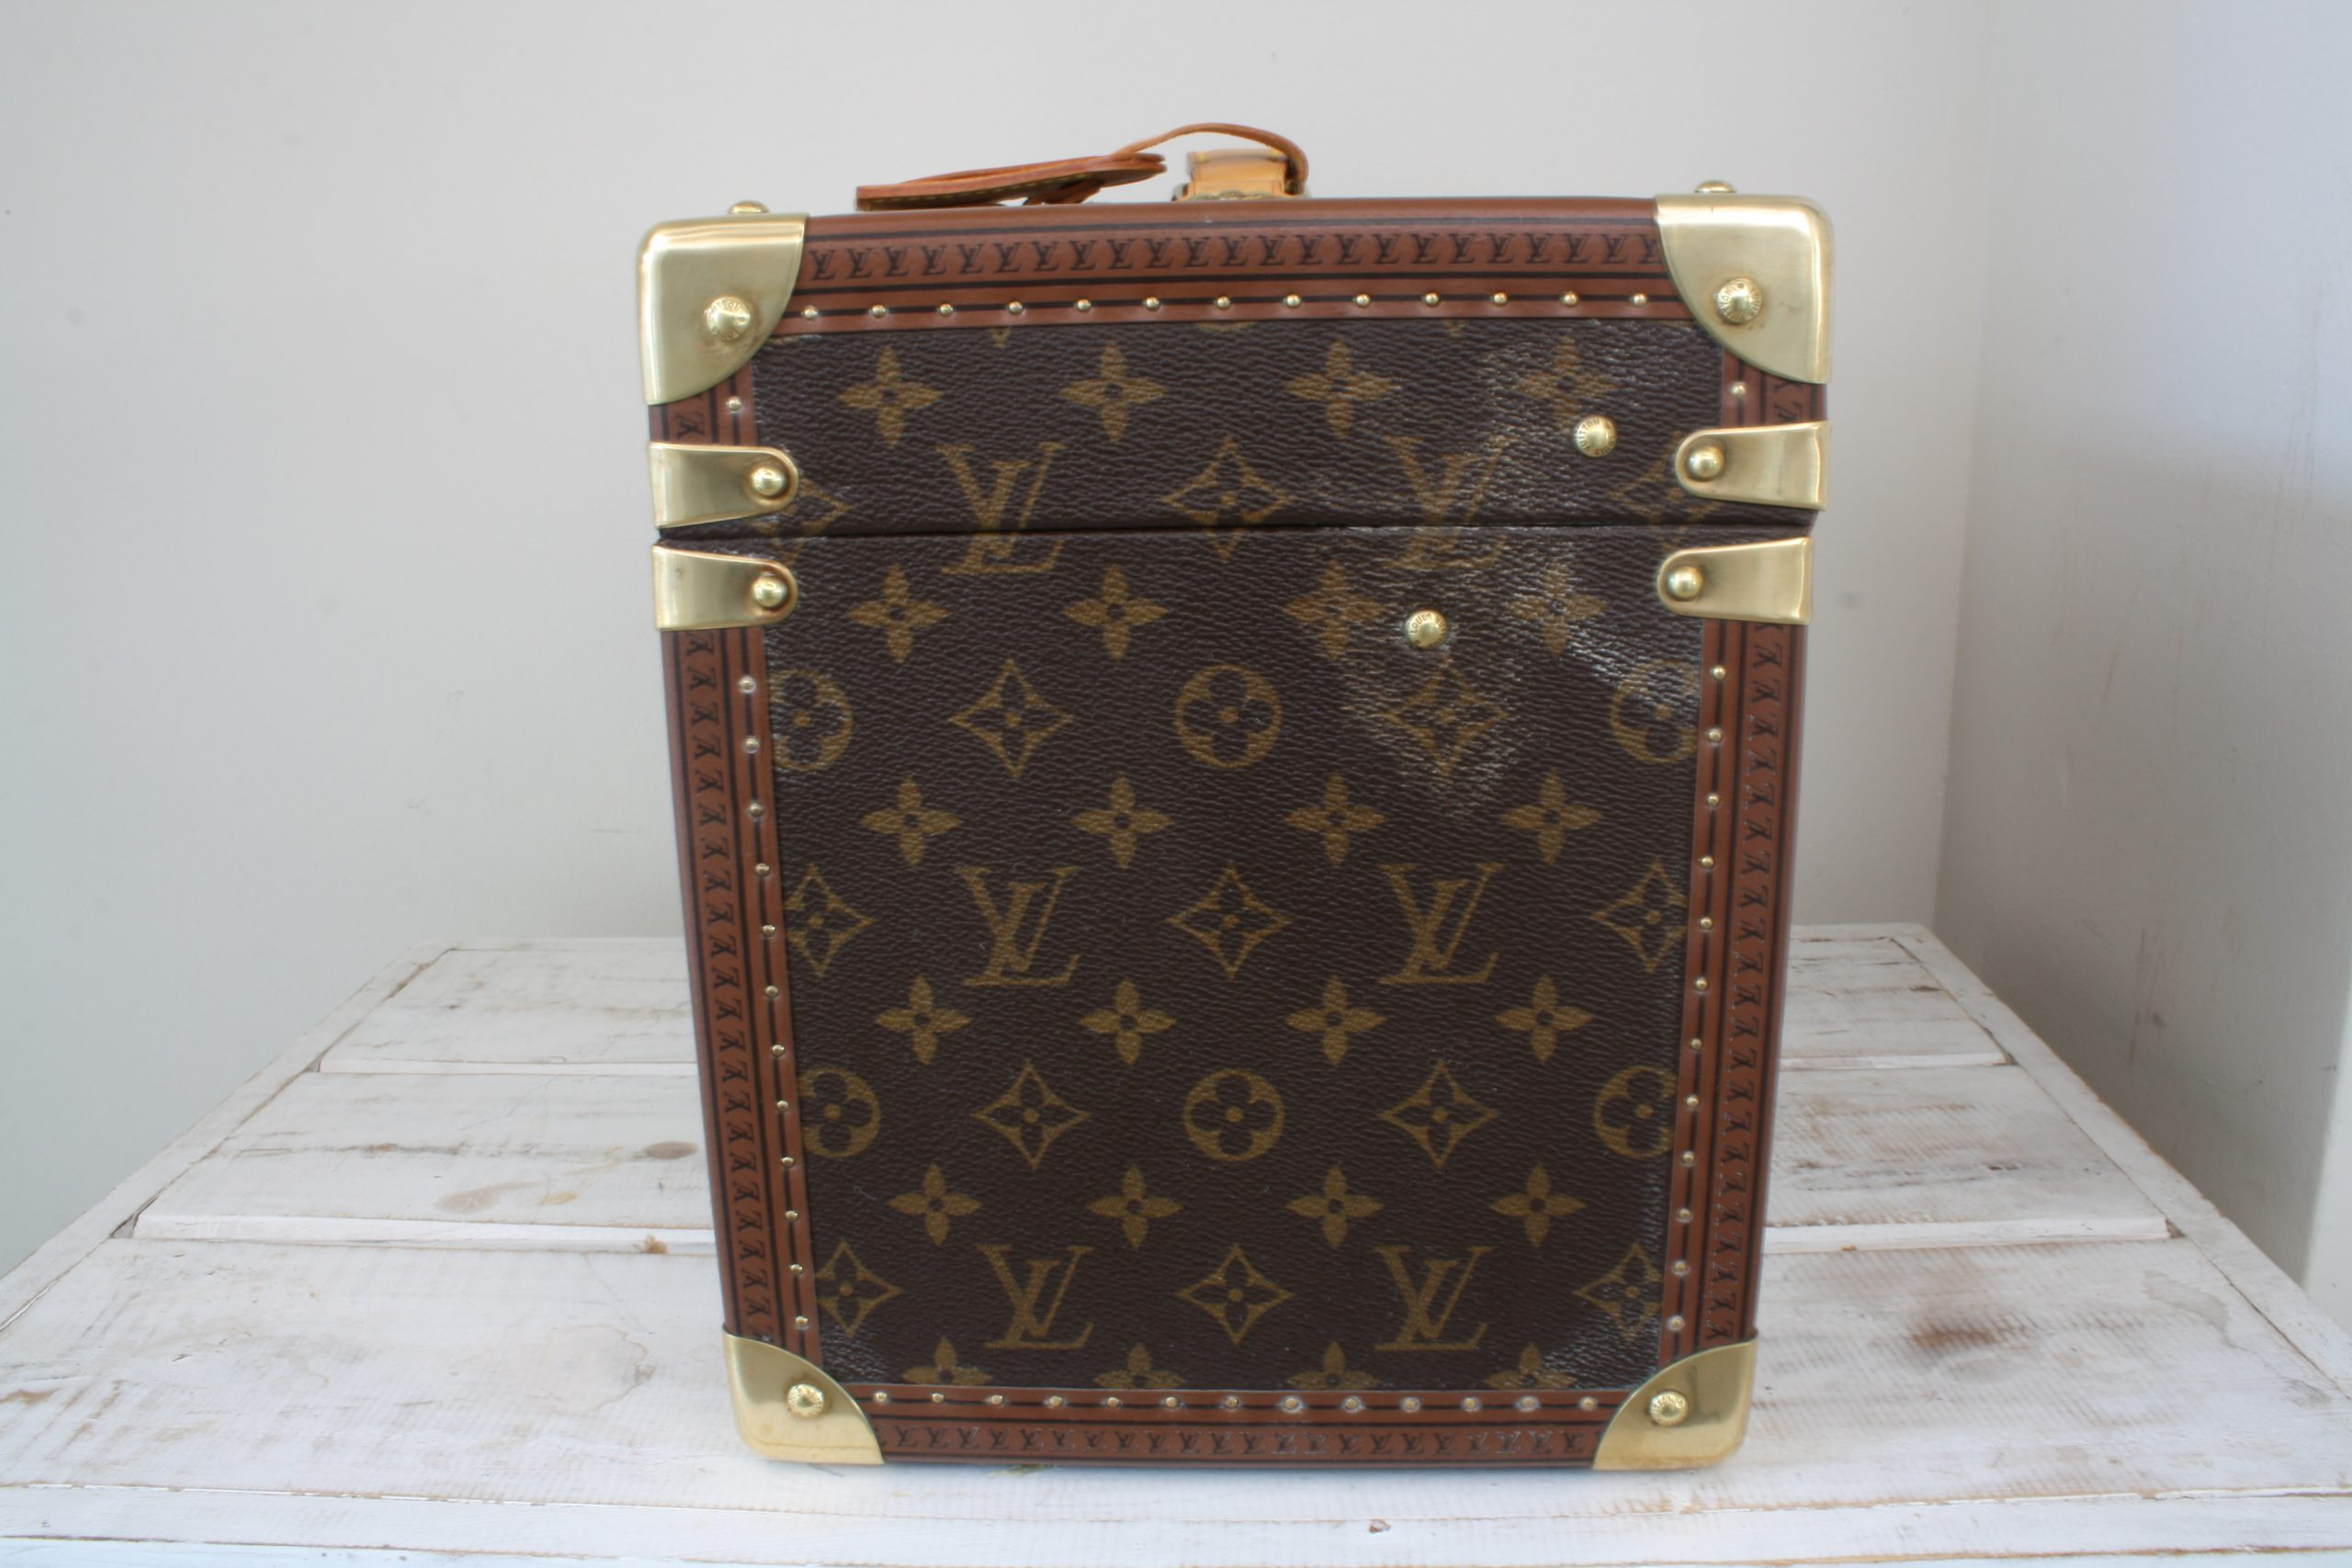 vintage-louis-vuitton-large-vanity-case-right-side